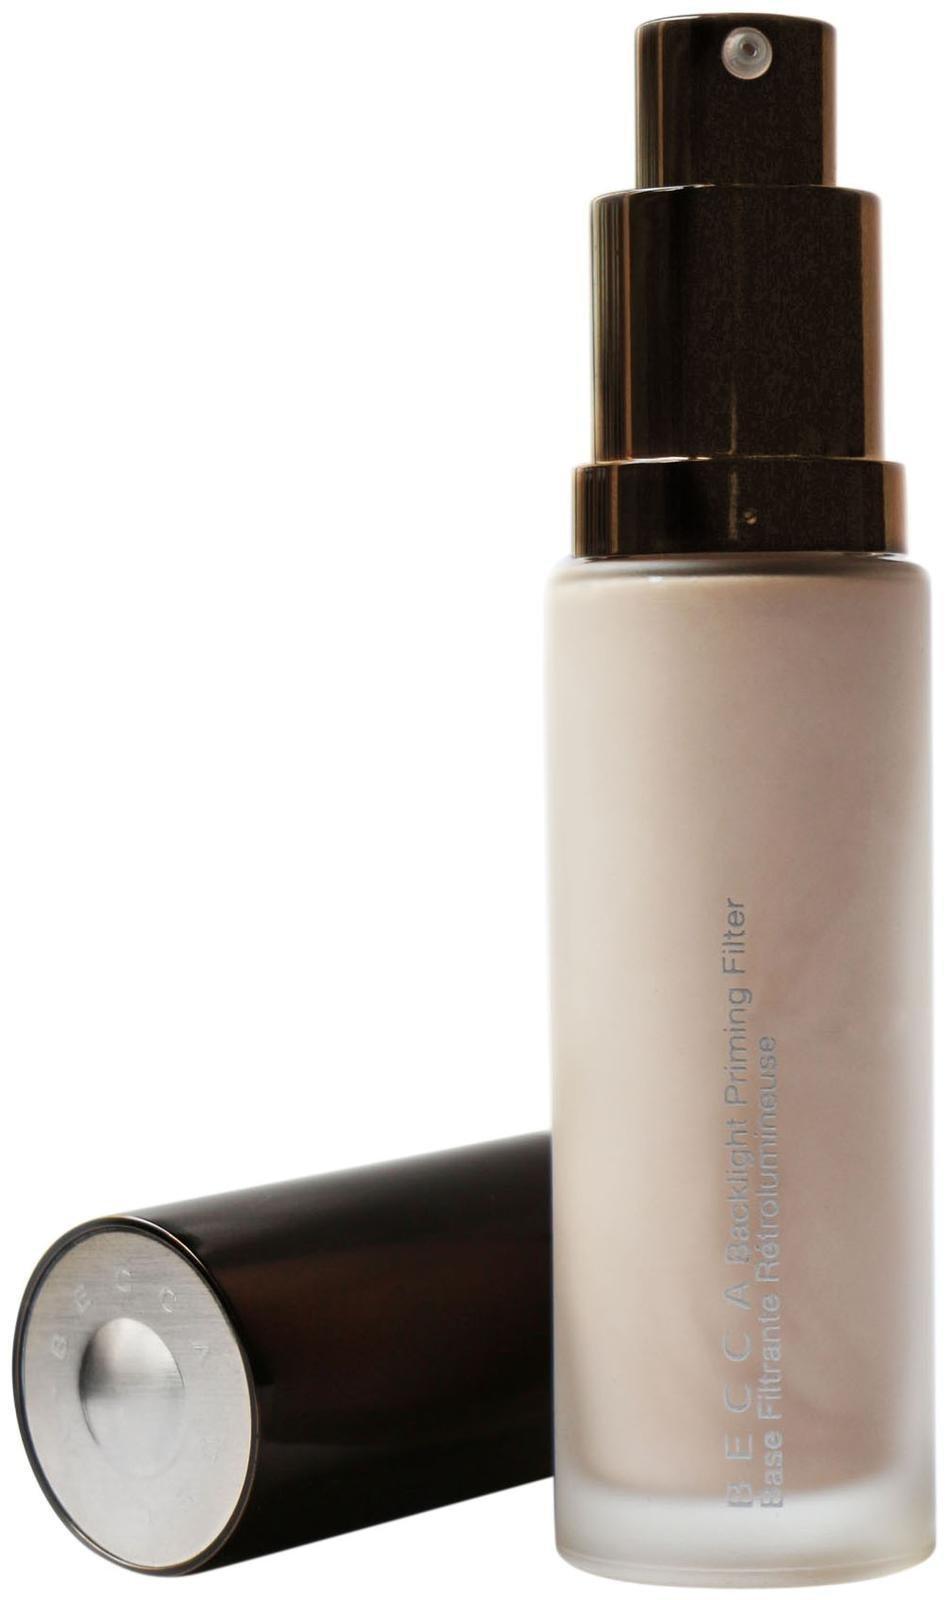 BECCA Cosmetics - Backlight Priming Filter 30mL/1Fl.oz